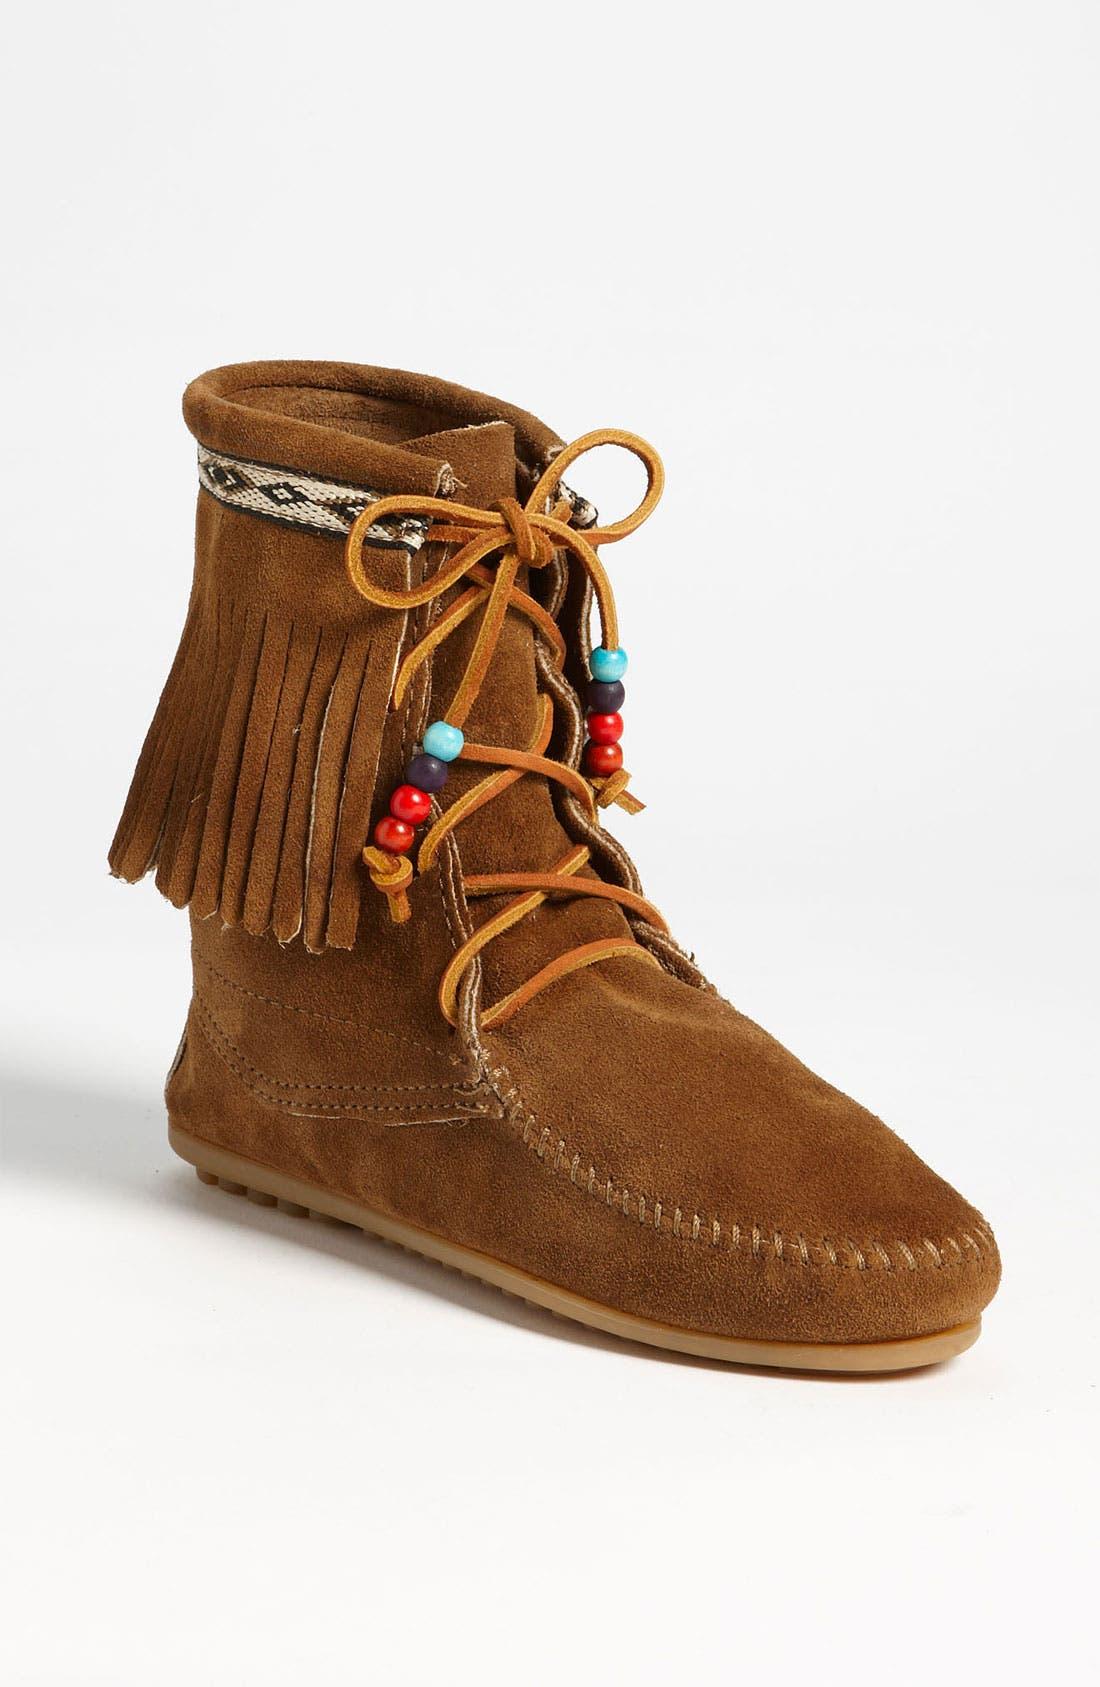 Main Image - Minnetonka 'Beaded Tramper' Boot